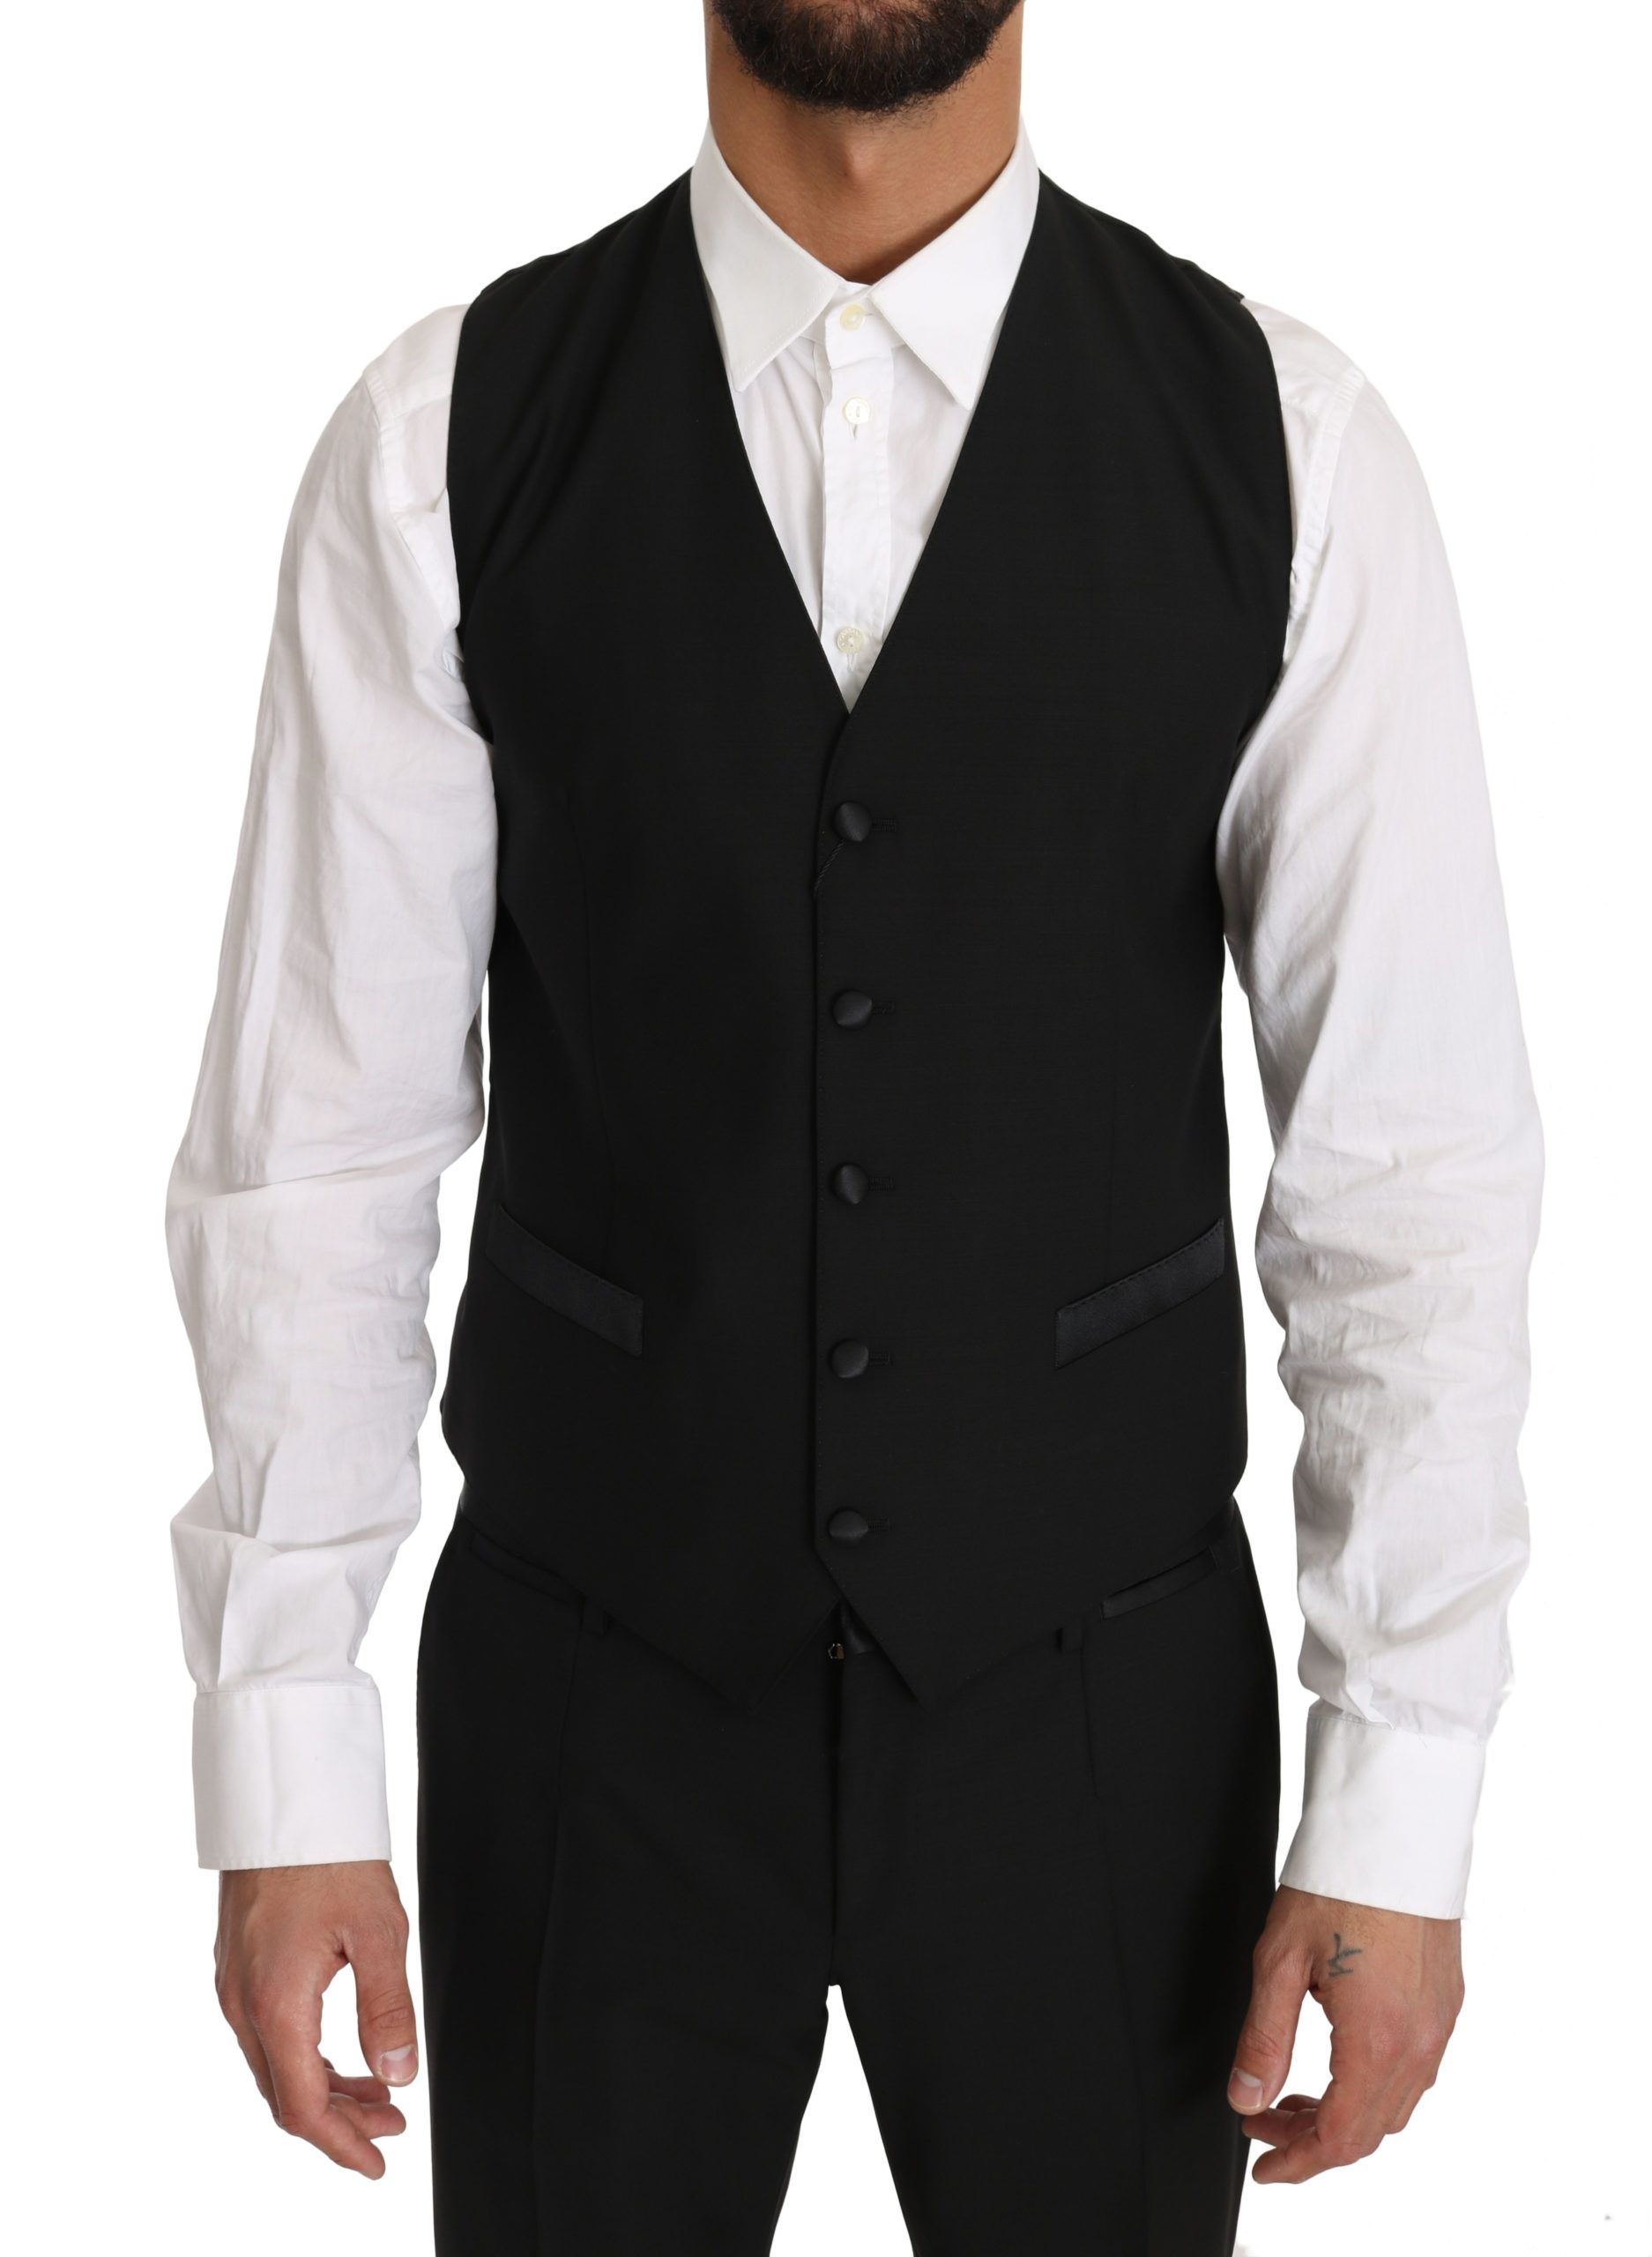 Dolce & Gabbana Black Wool Dress Waistcoat Gillet Vest